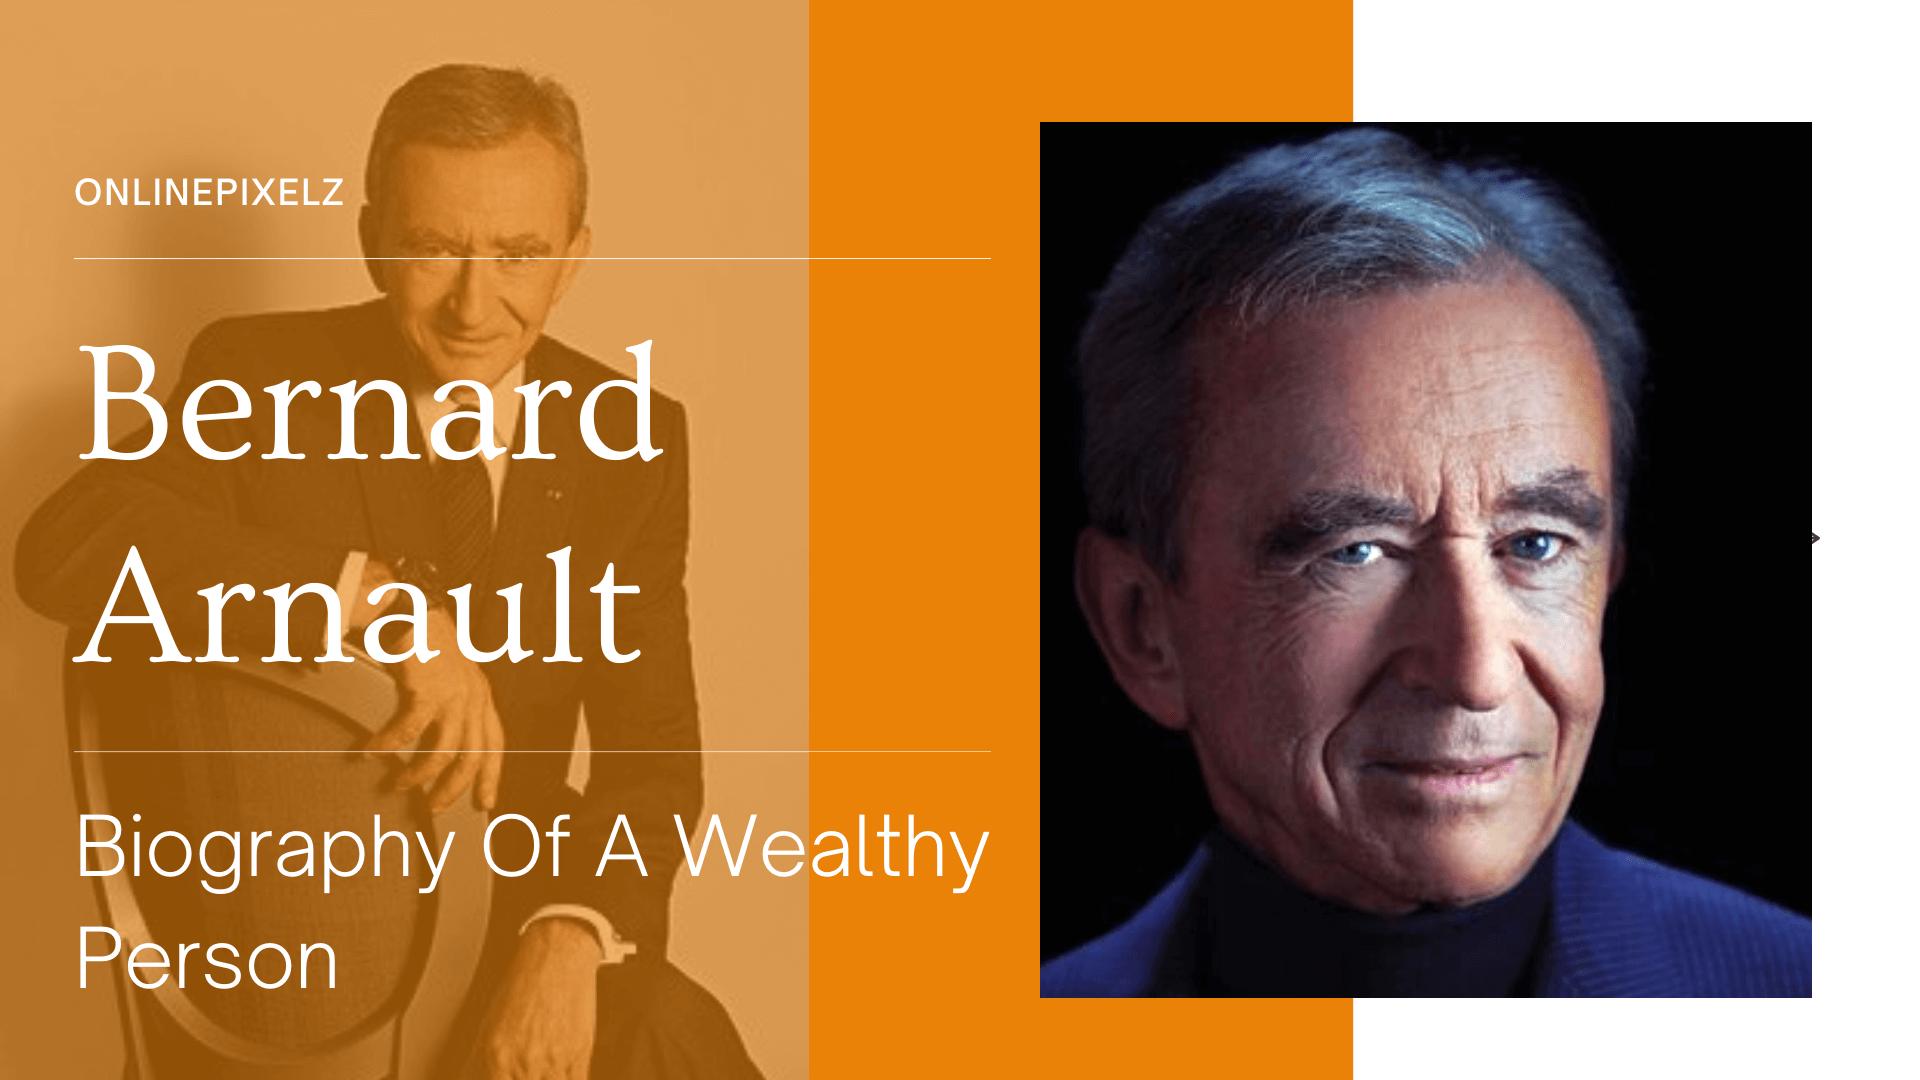 Bernard Arnault - Biography Of A Wealthy Person